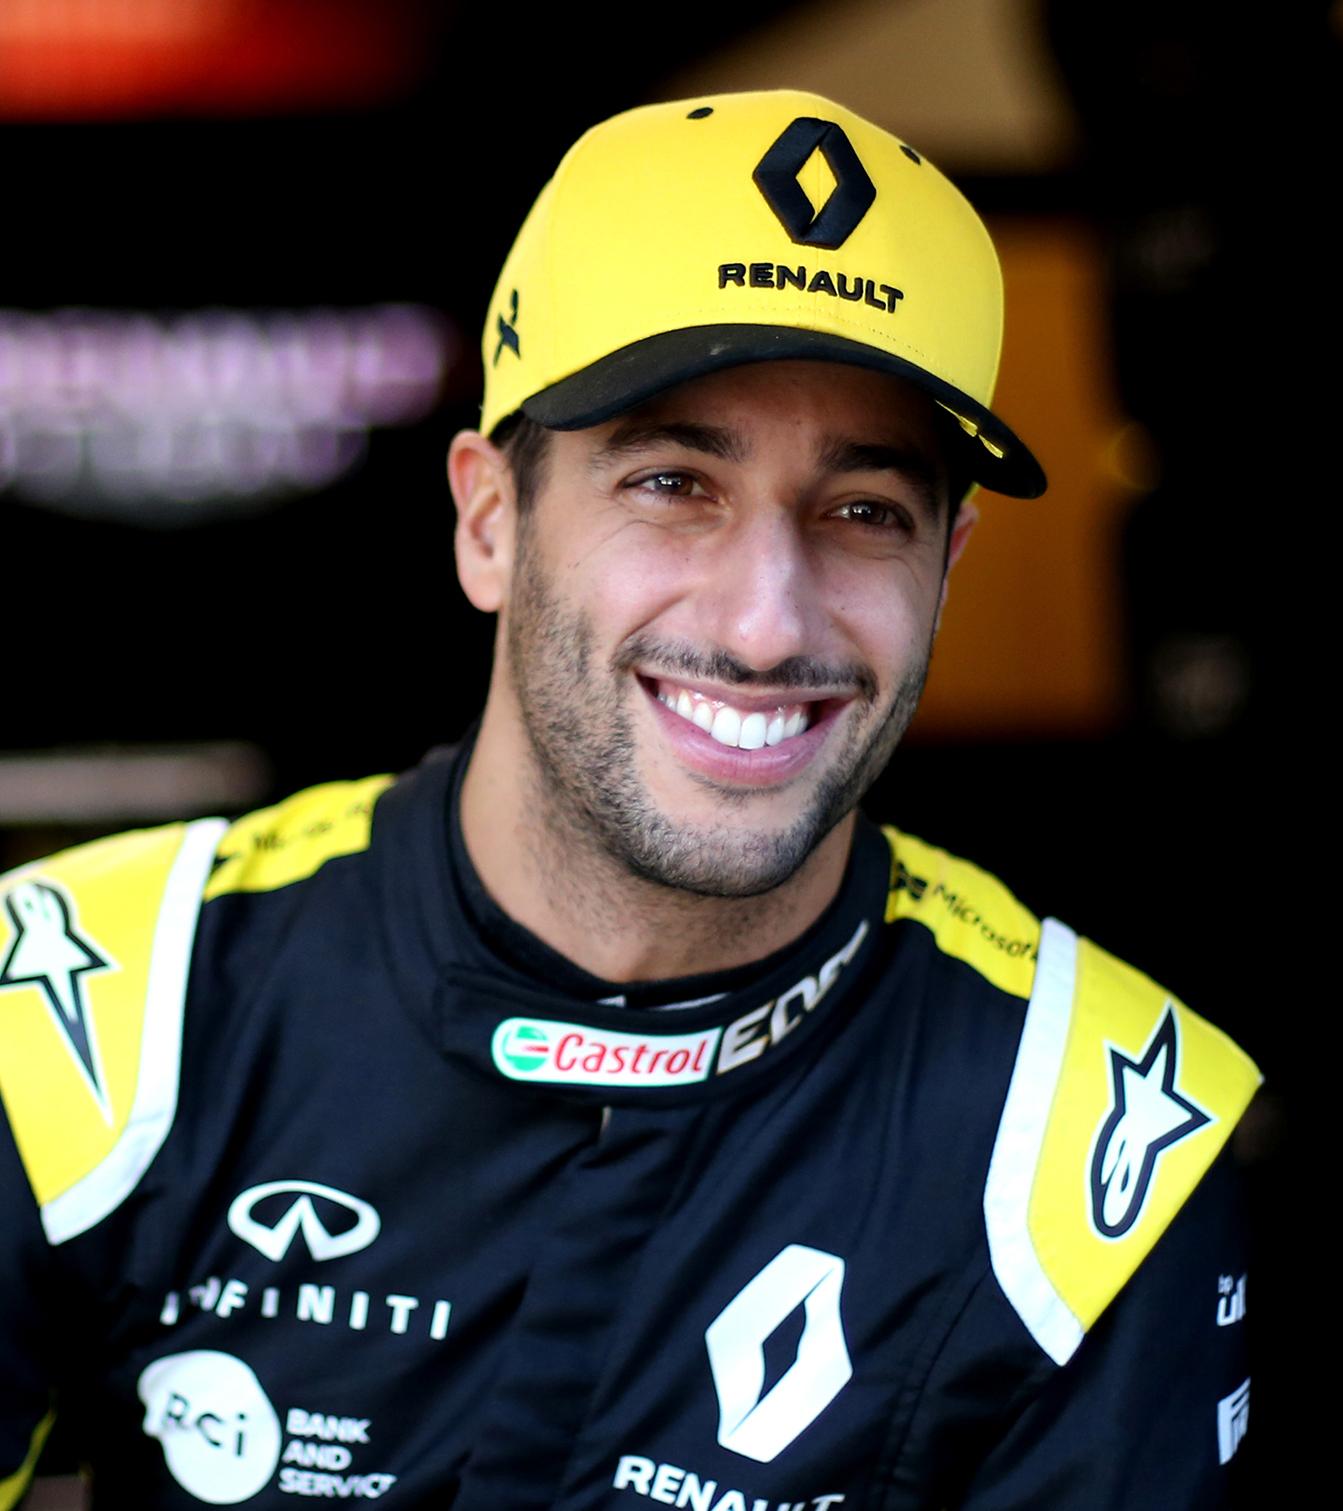 INFINITI and Renault Sport Formula 1 Driver Carlos Sainz